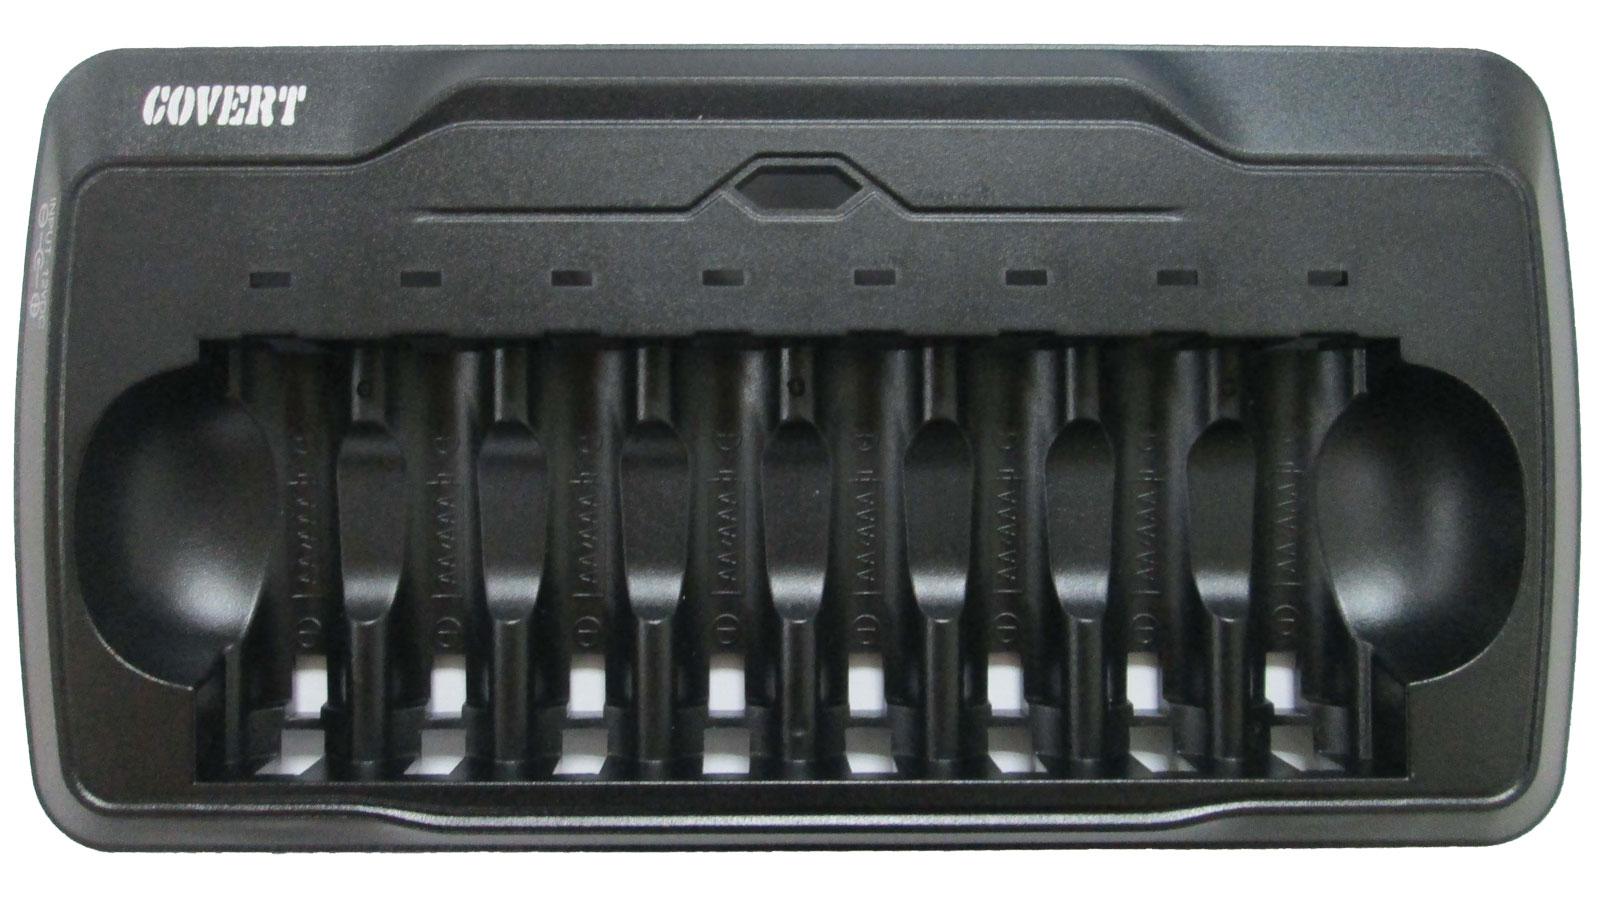 Covert 2717 8 AA Battery Rapid